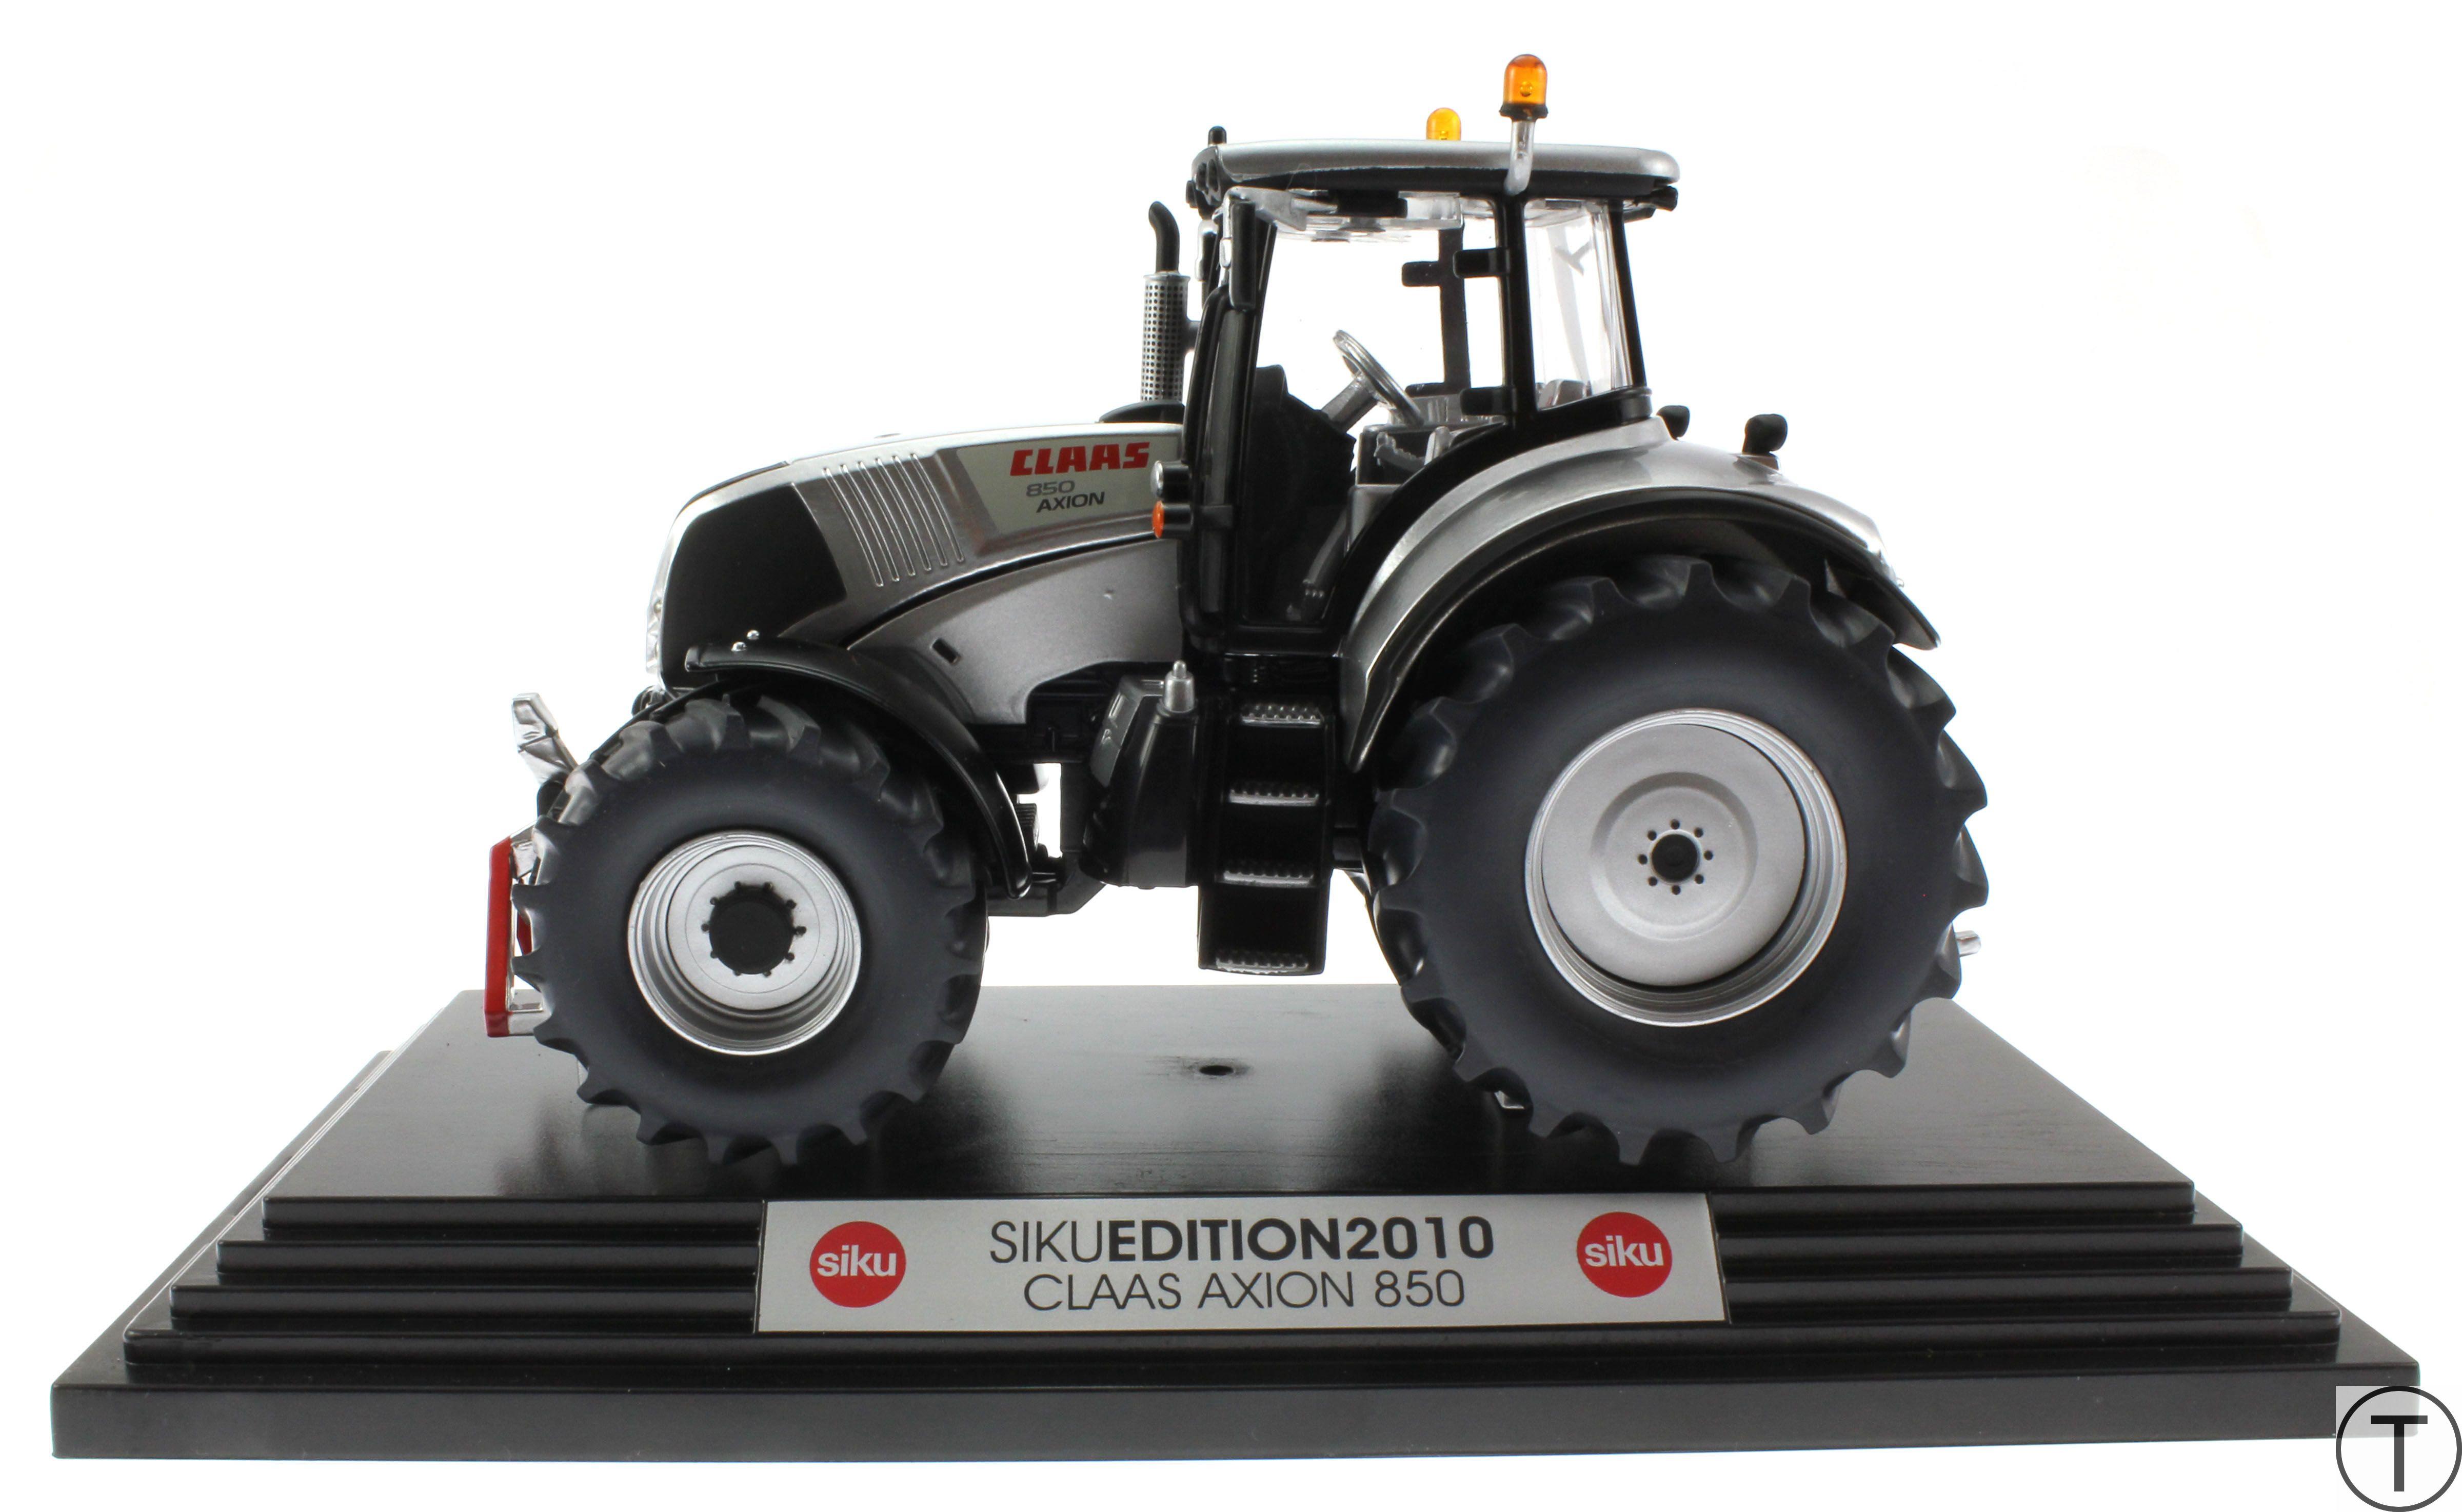 siku-4485-Claas-Axion-850-Silver-Edition-2010